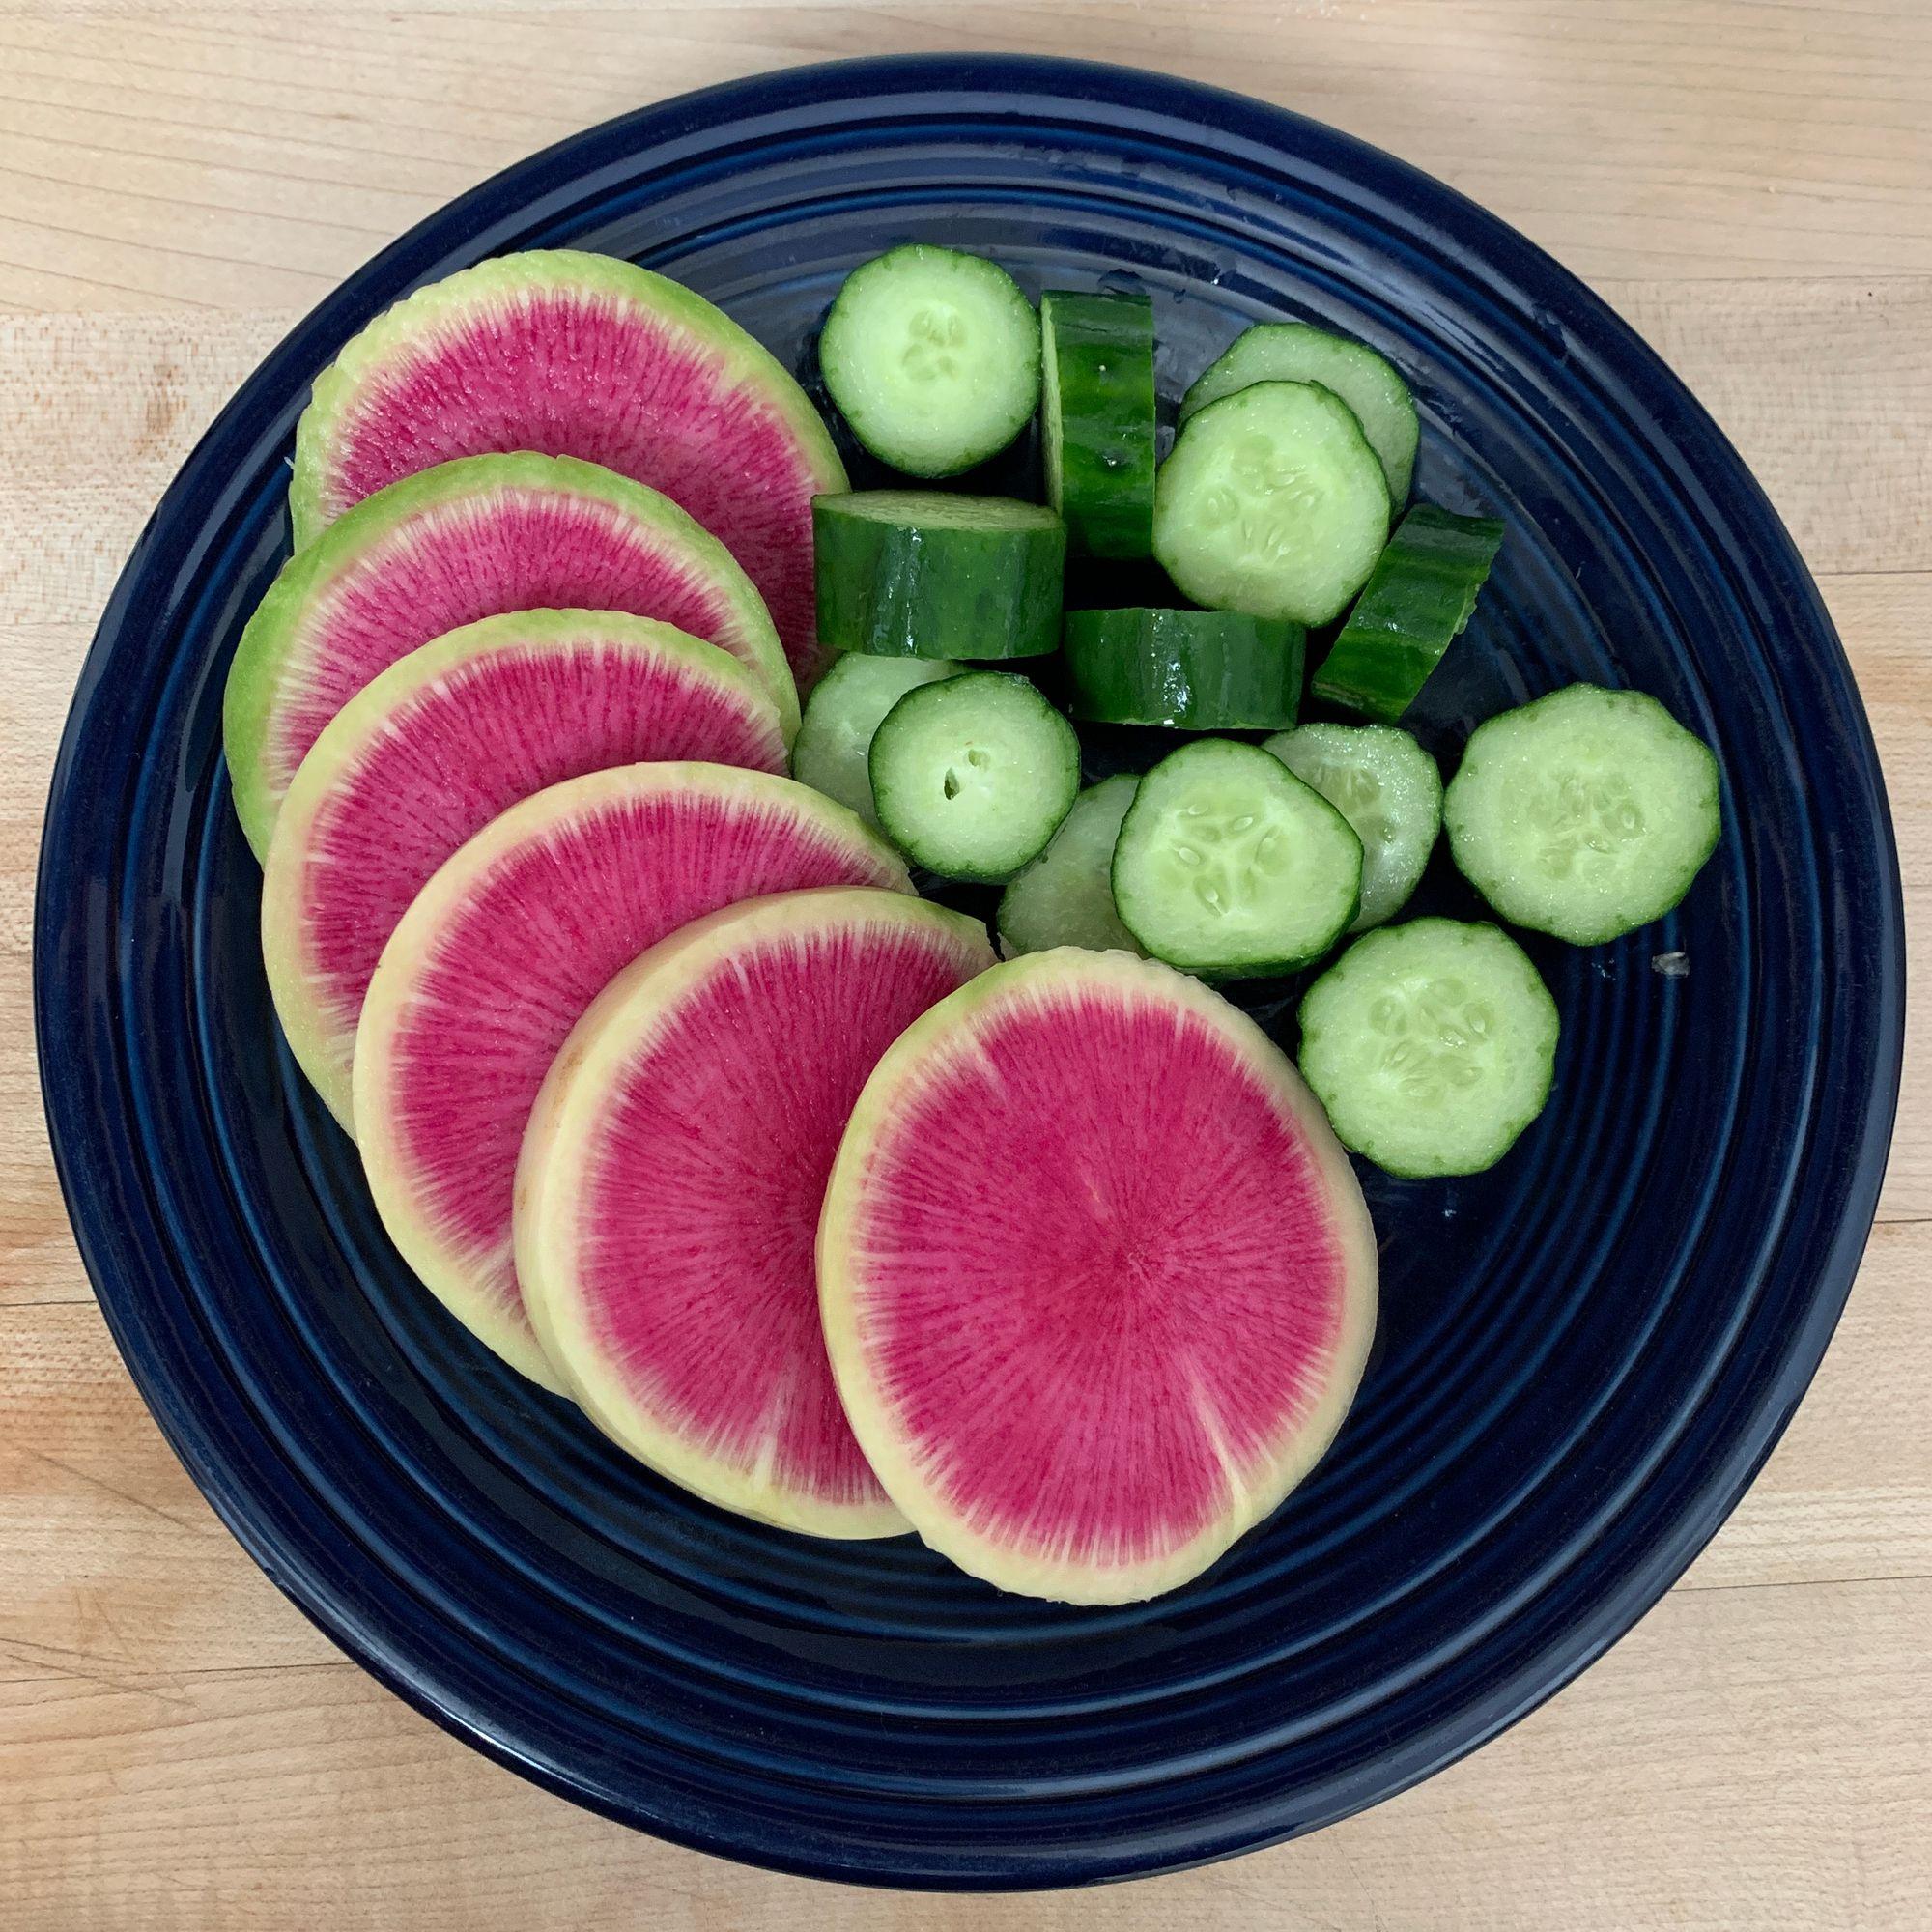 Snack Time What Do Vegan Vegetarian Paleo Keto Dash